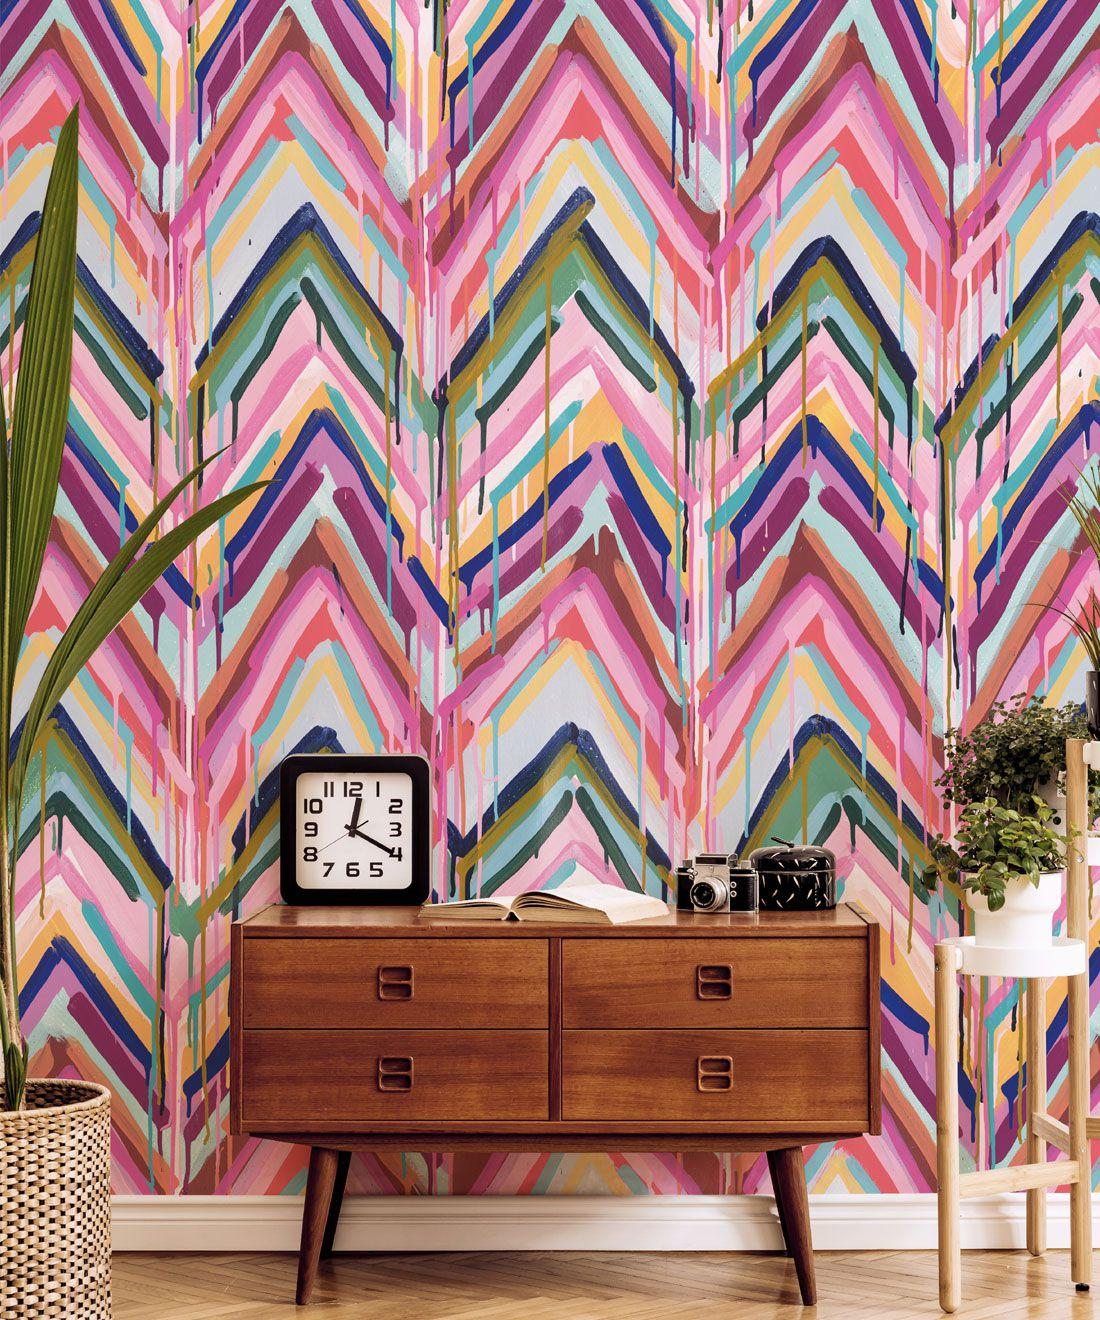 Crossroads Wallpaper •Colourful Painterly Wallpaper • Tiff Manuell • Chevron Wallpaper • Close Up Insitu